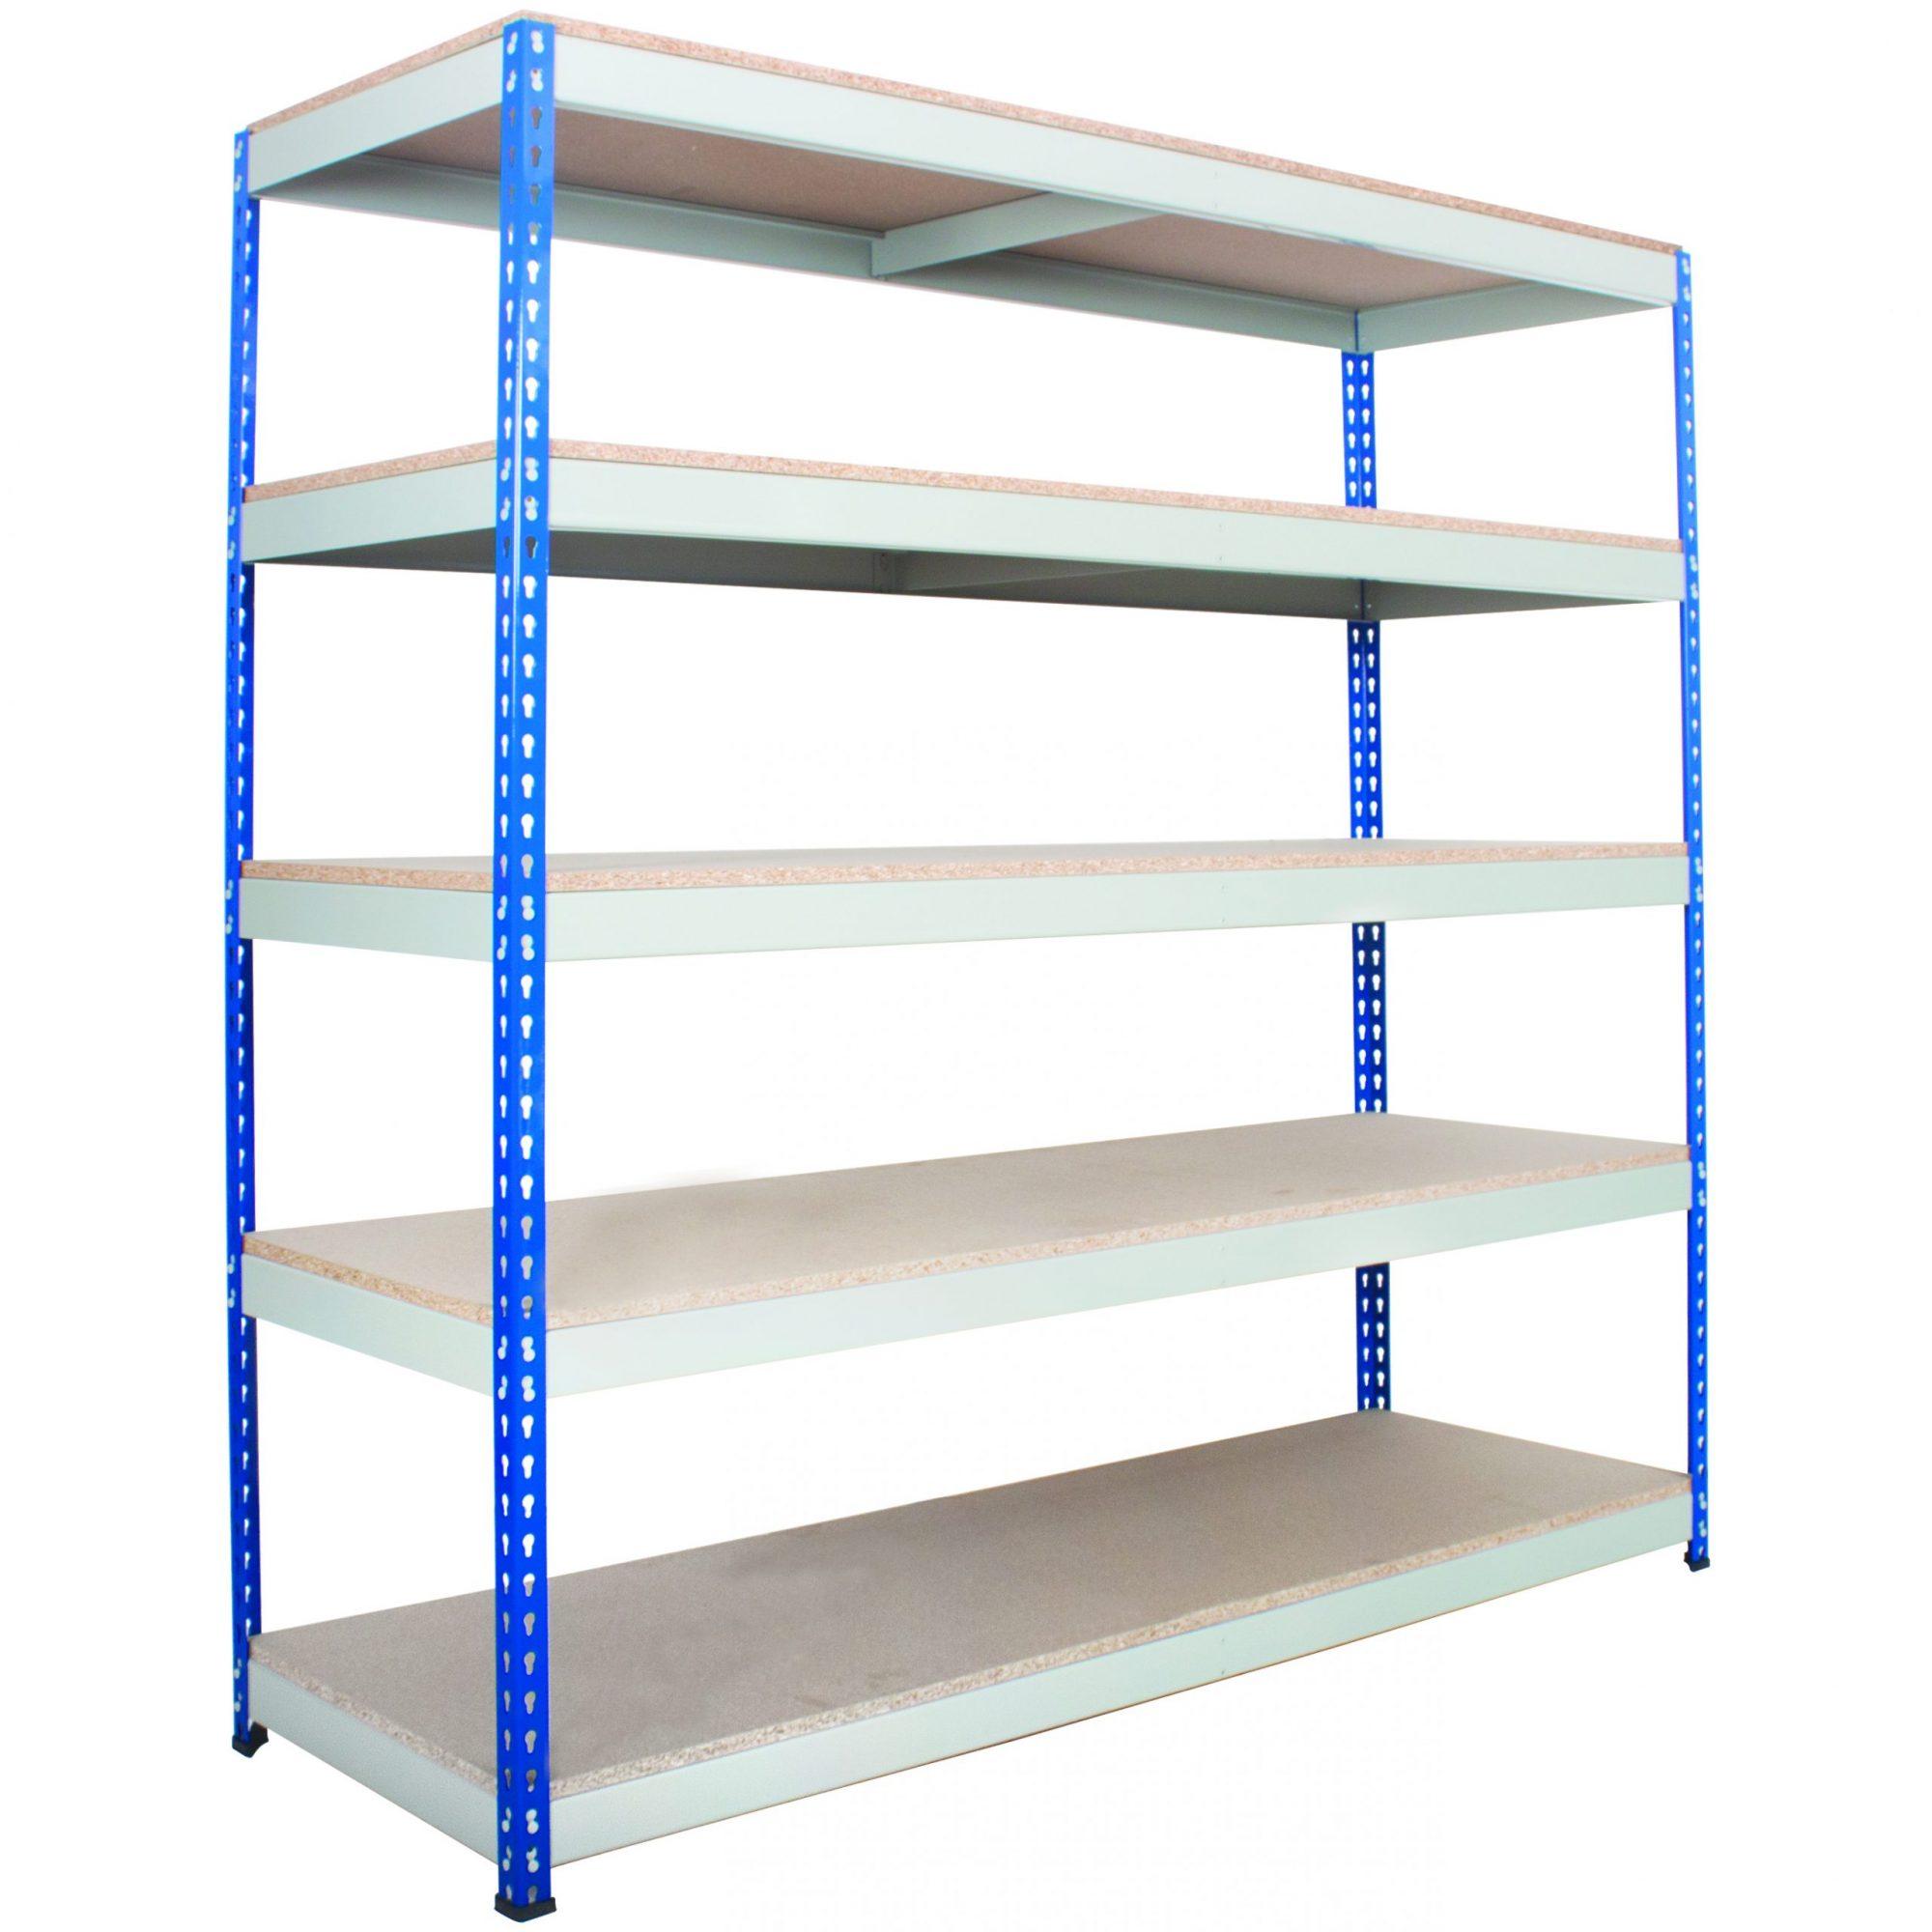 Industrial Shelving Unit Warehouse Storeroom Llm Handling